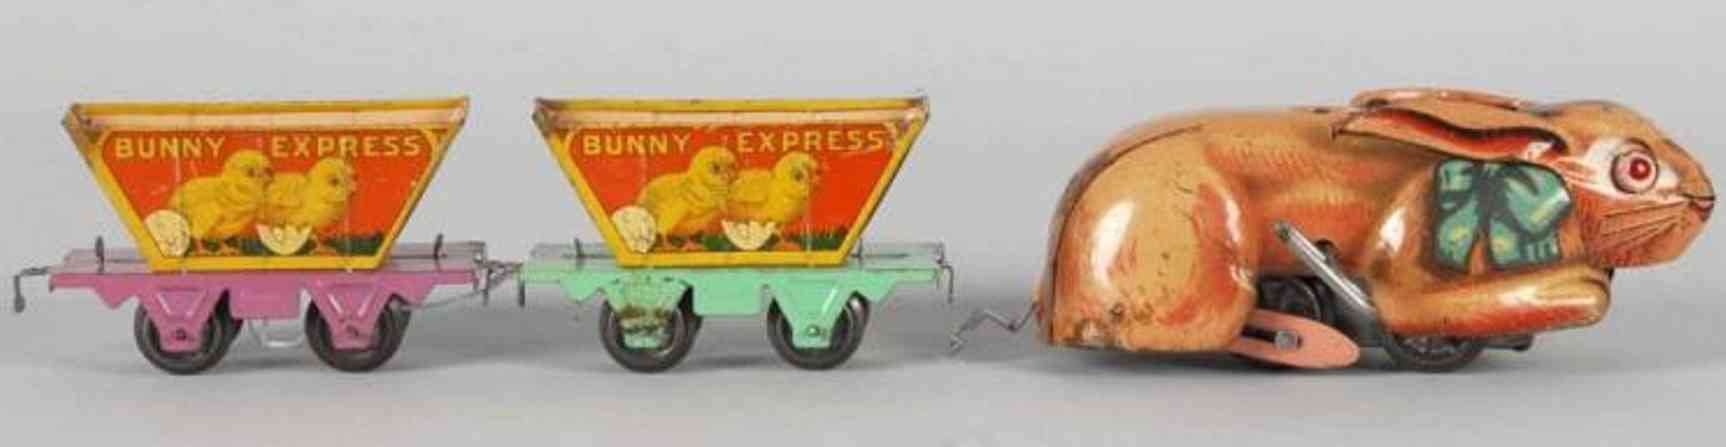 marx louis railway toy bunny express train set